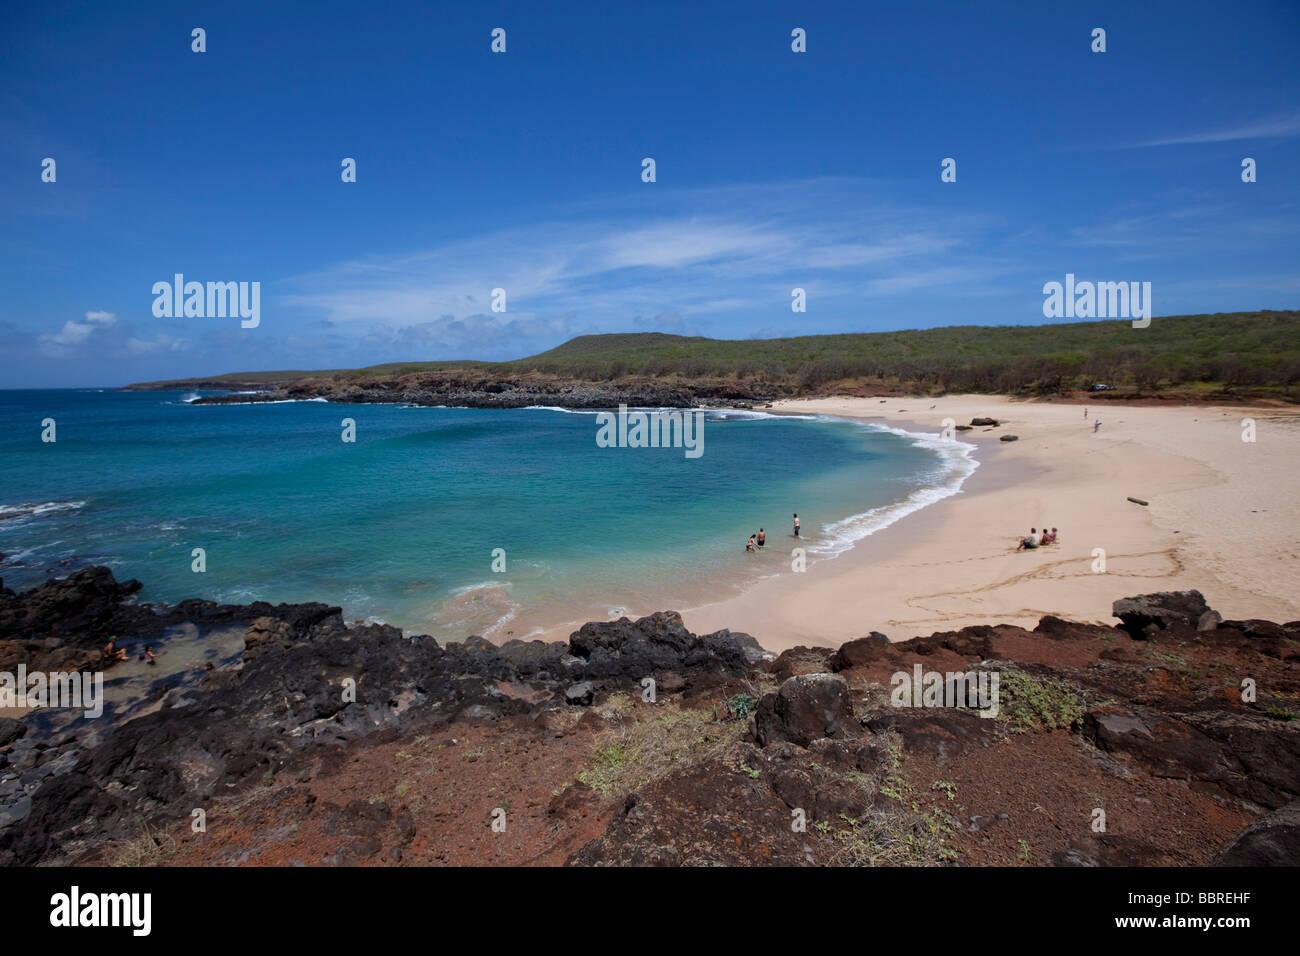 Kawakui Bay Molokai Hawaii plage Plages Banque D'Images